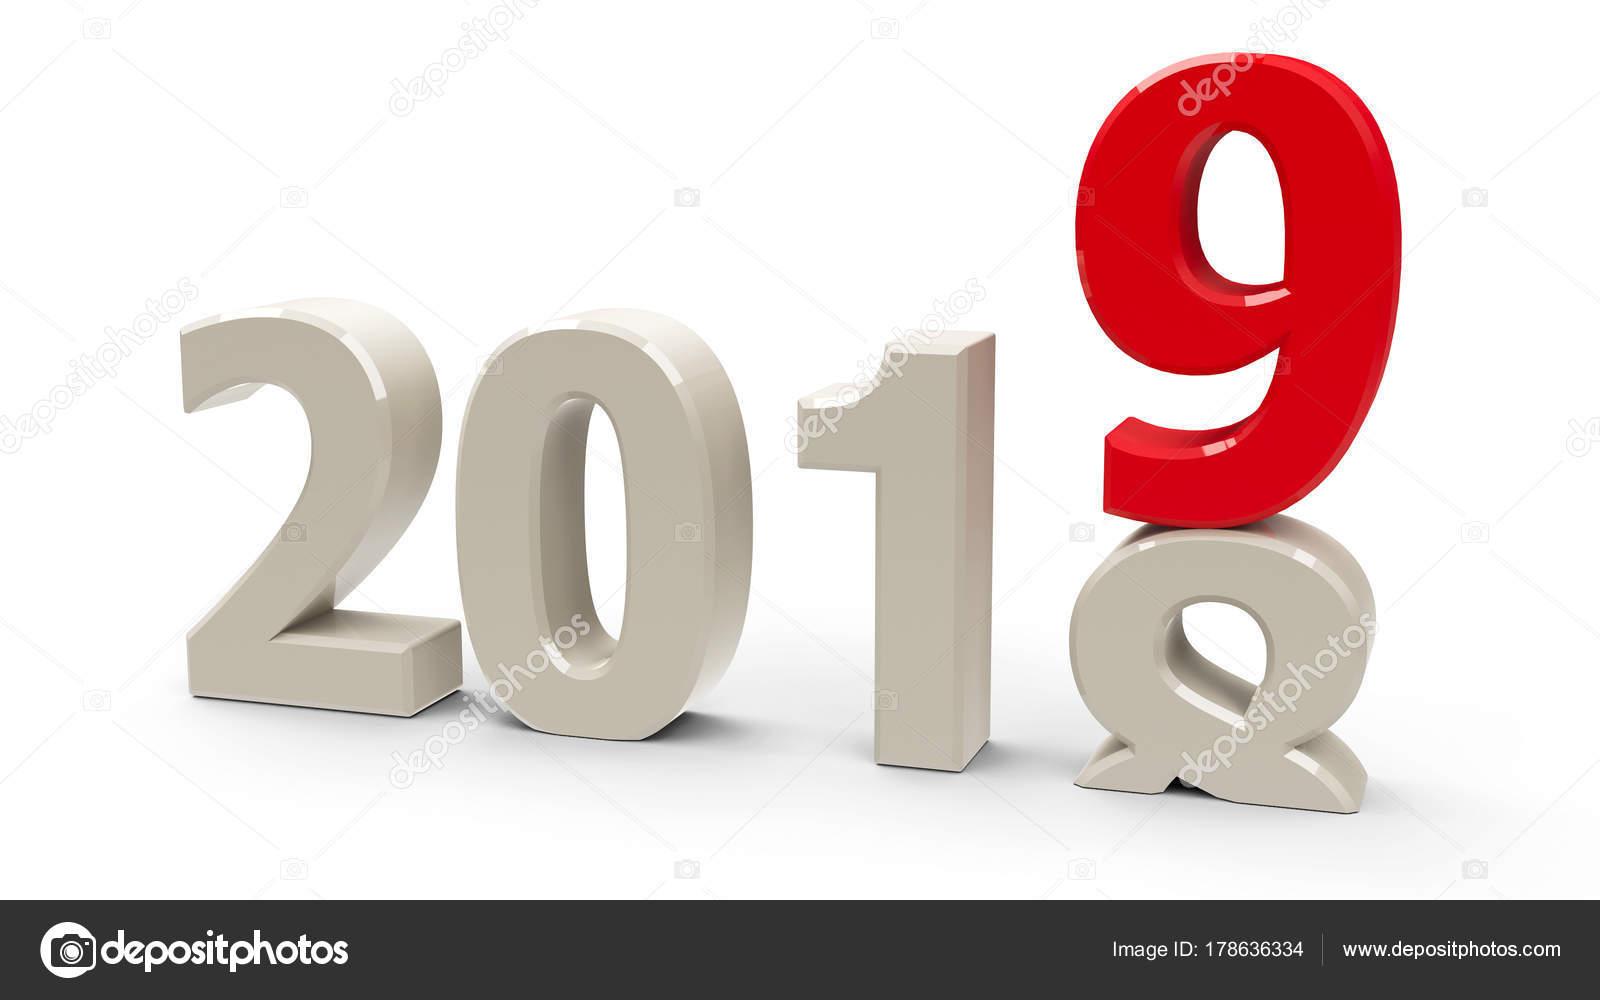 2018 2019 stock photo oakozhan 178636334